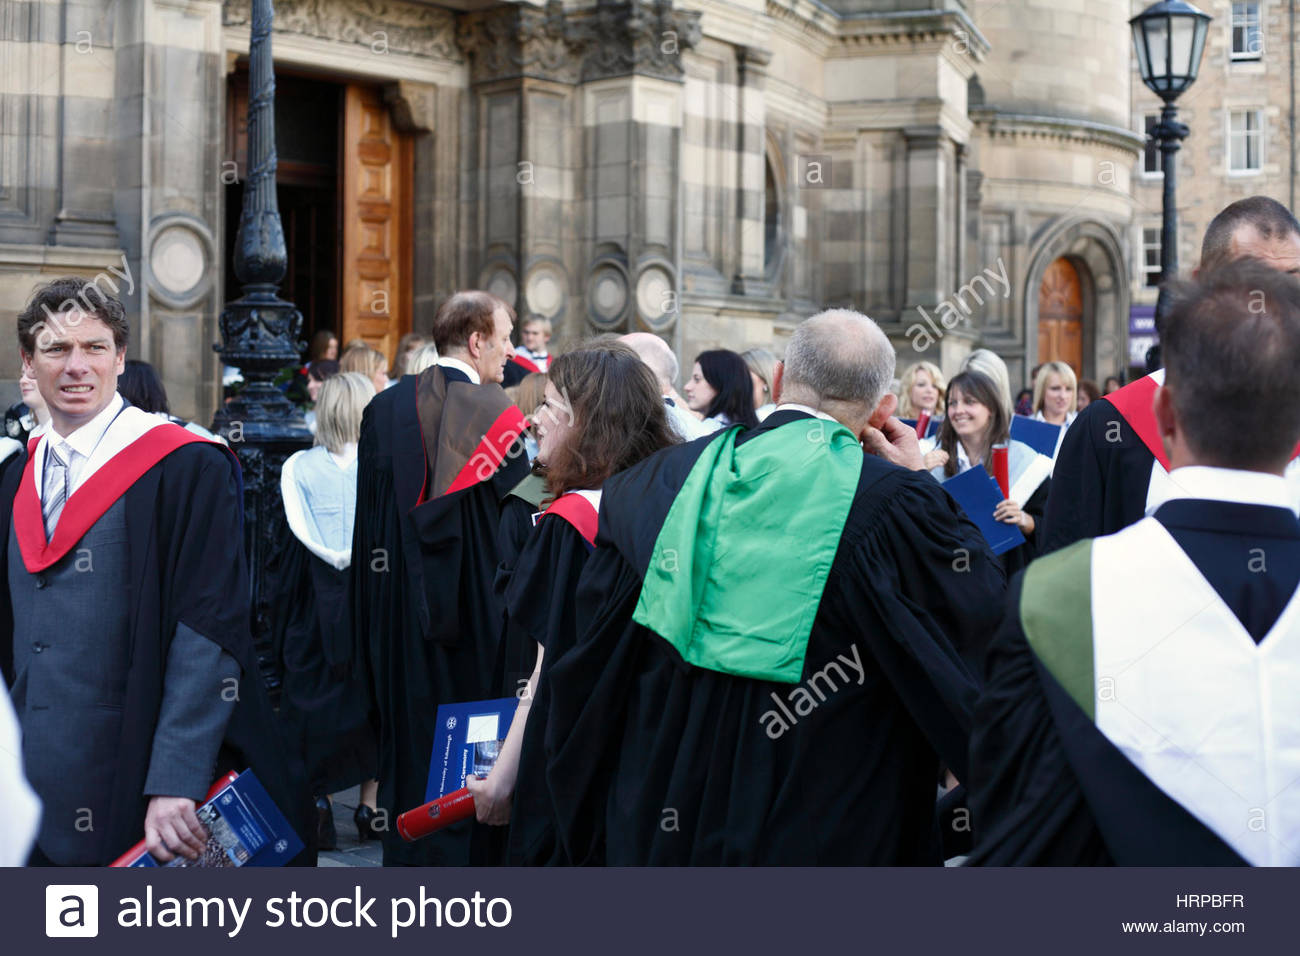 Edinburgh University students graduation day at MCewan Hall. - Stock Image